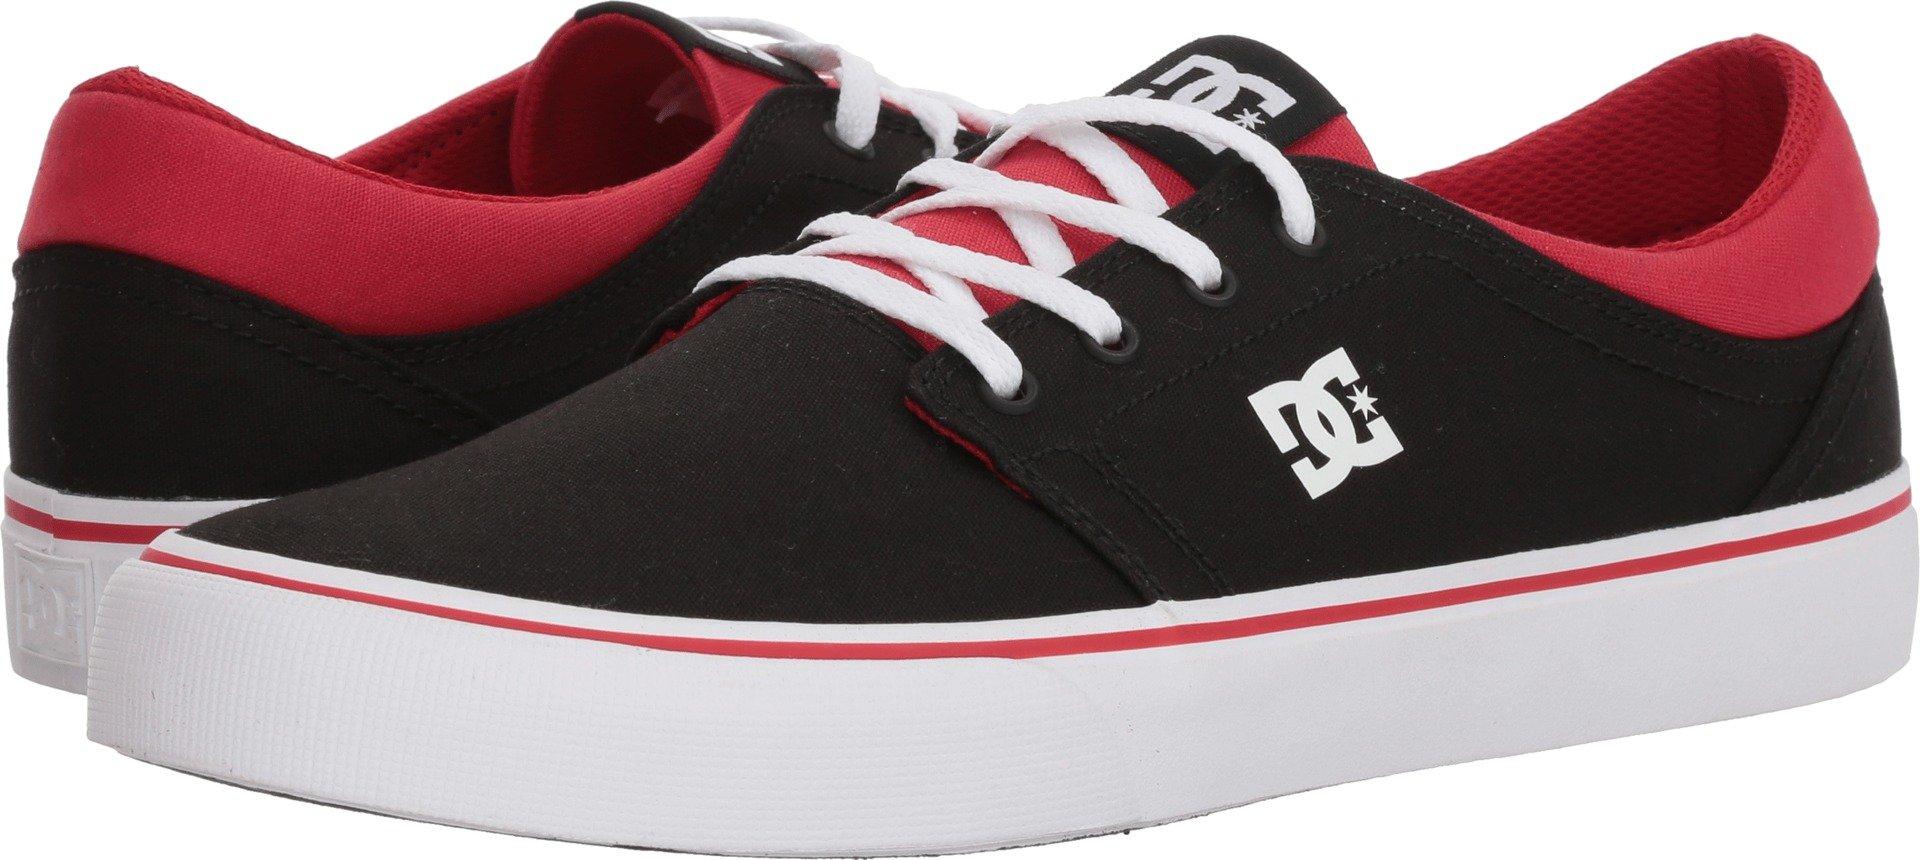 DC Men's Trase TX Skate Shoe, Black/Athletic Red/Black, 10.5D D US by DC